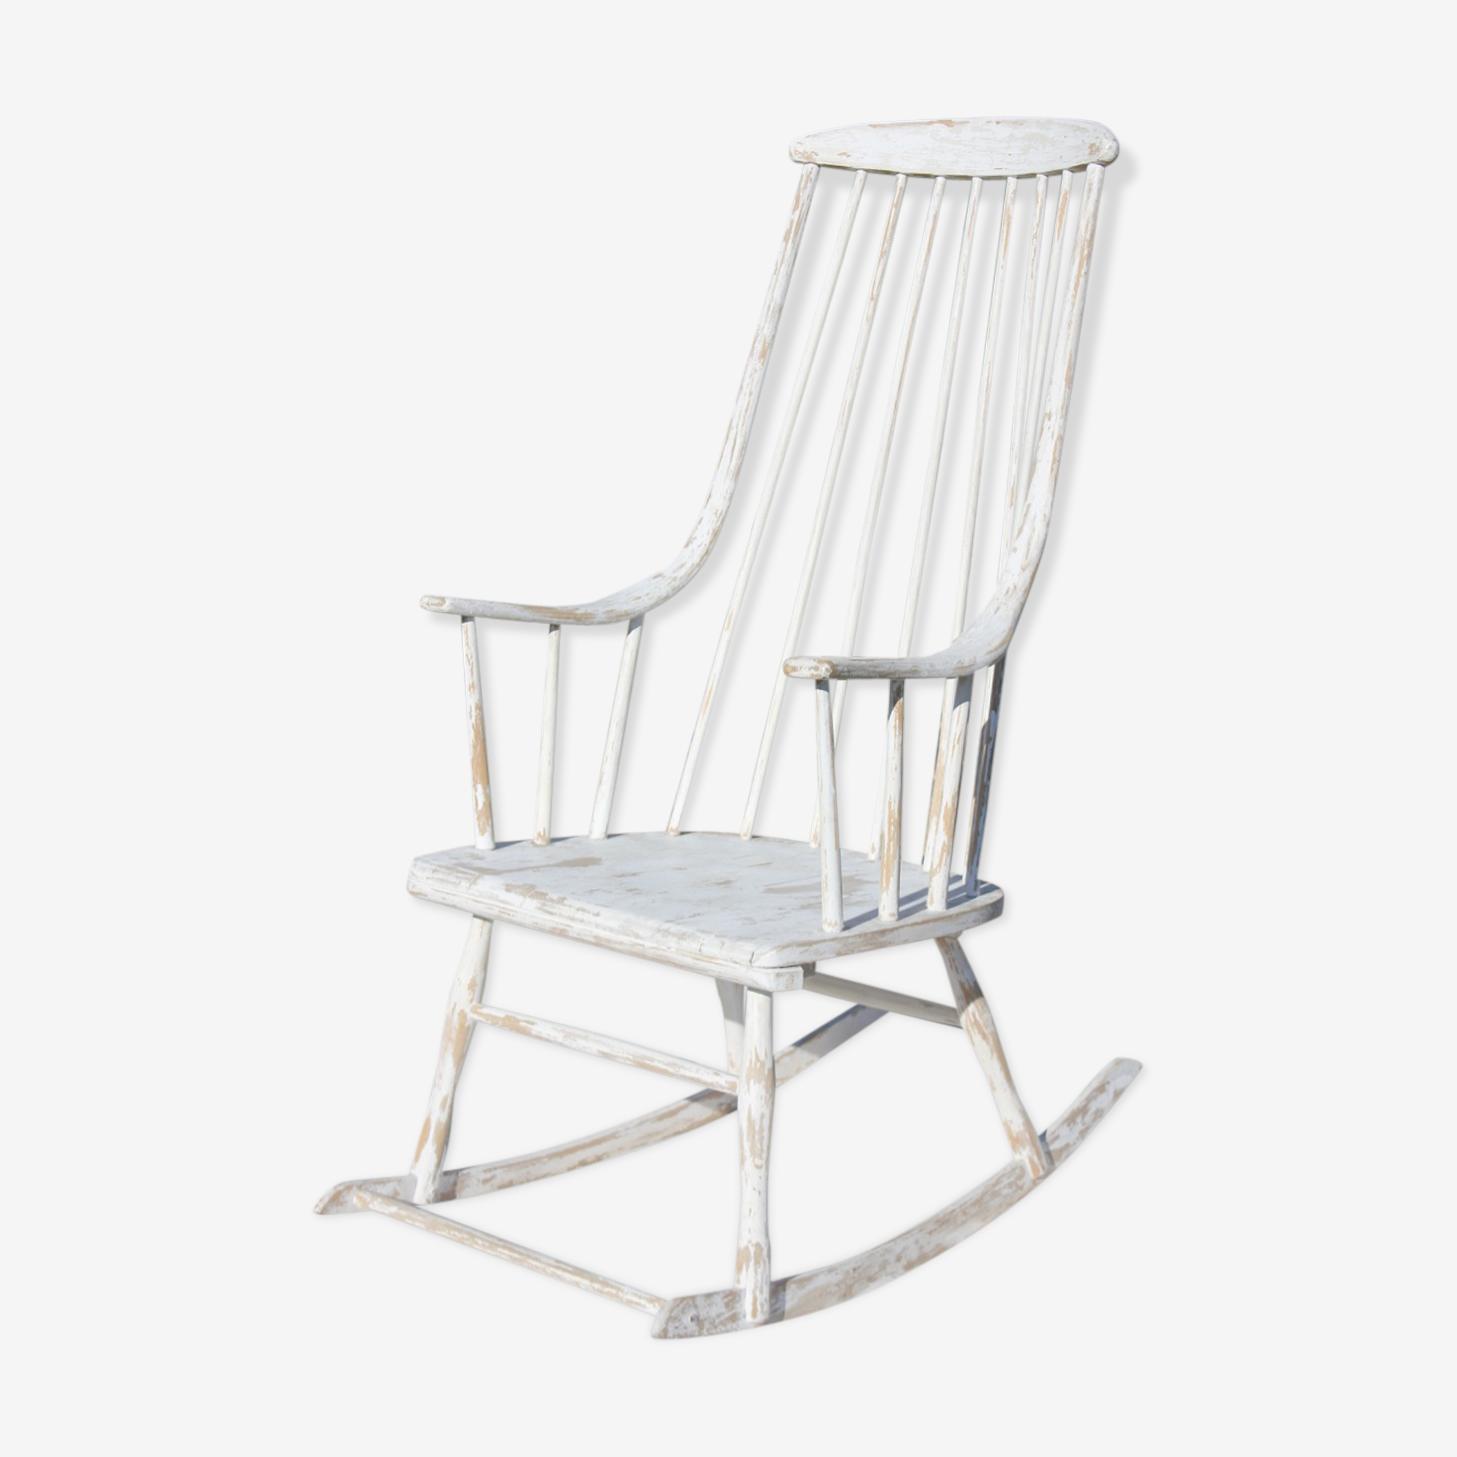 Rocking chair Lena Larsson modèle Grandessa